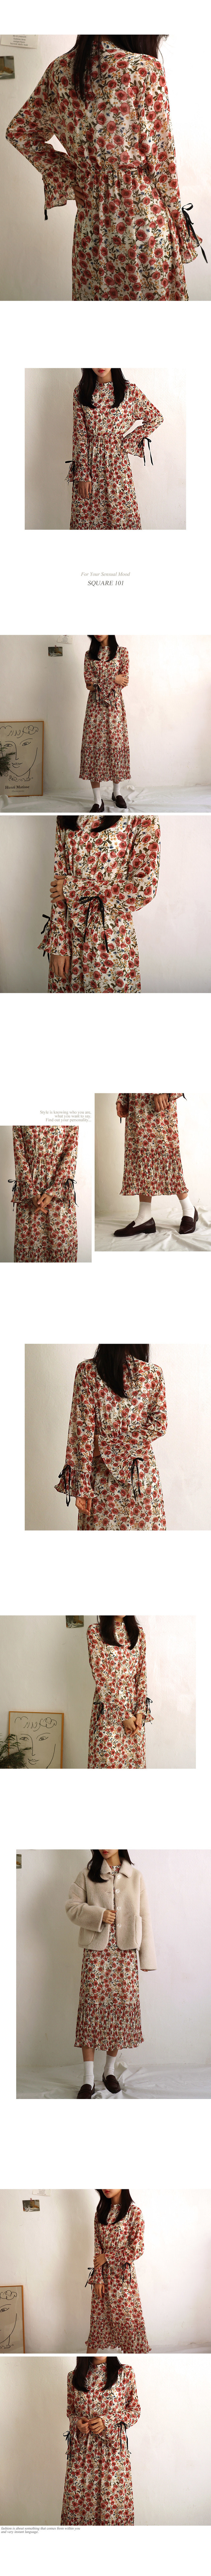 Rose Dressy Frilly Dress